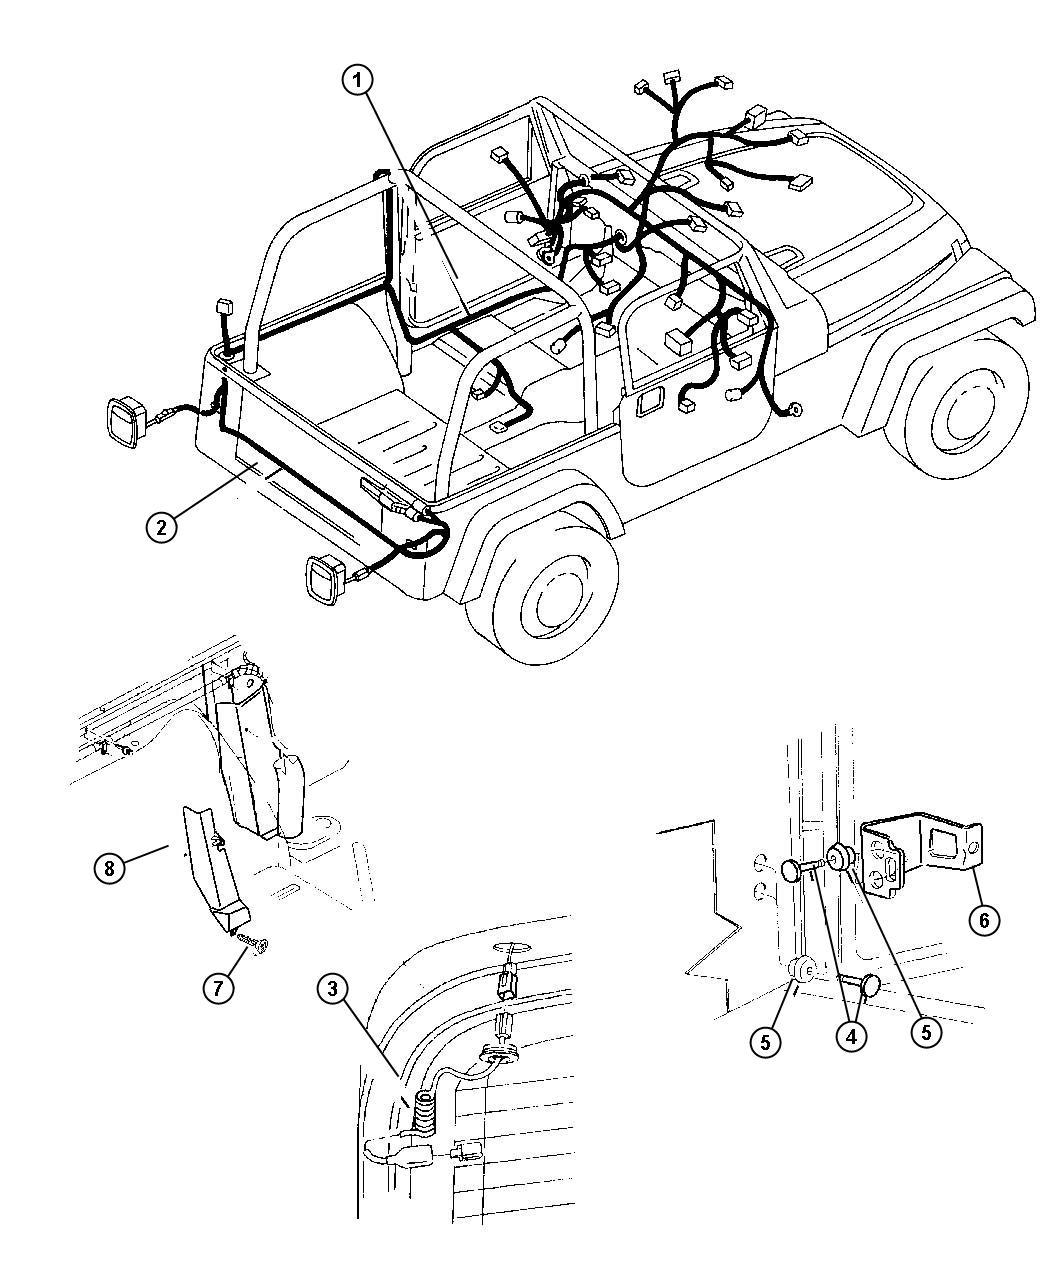 Jeep Patriot Rivet Mounting Hold Intake Manifold Gasket